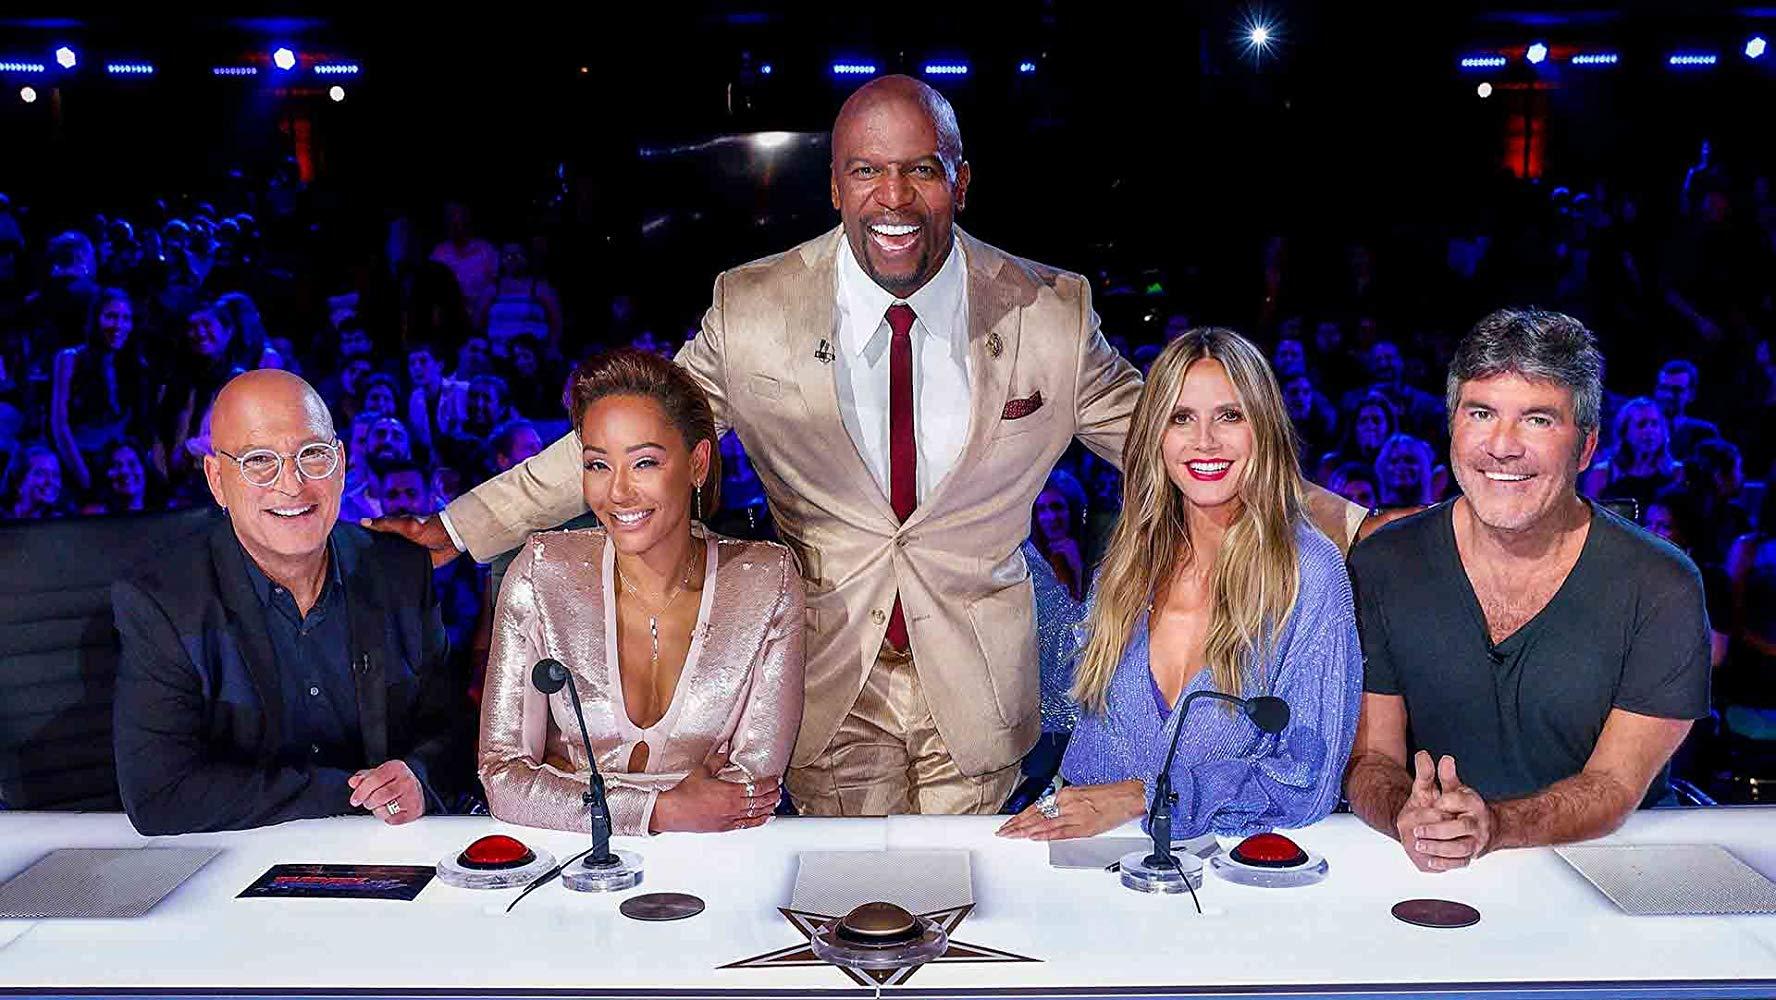 America's Got Talent: The Champions - Season 1